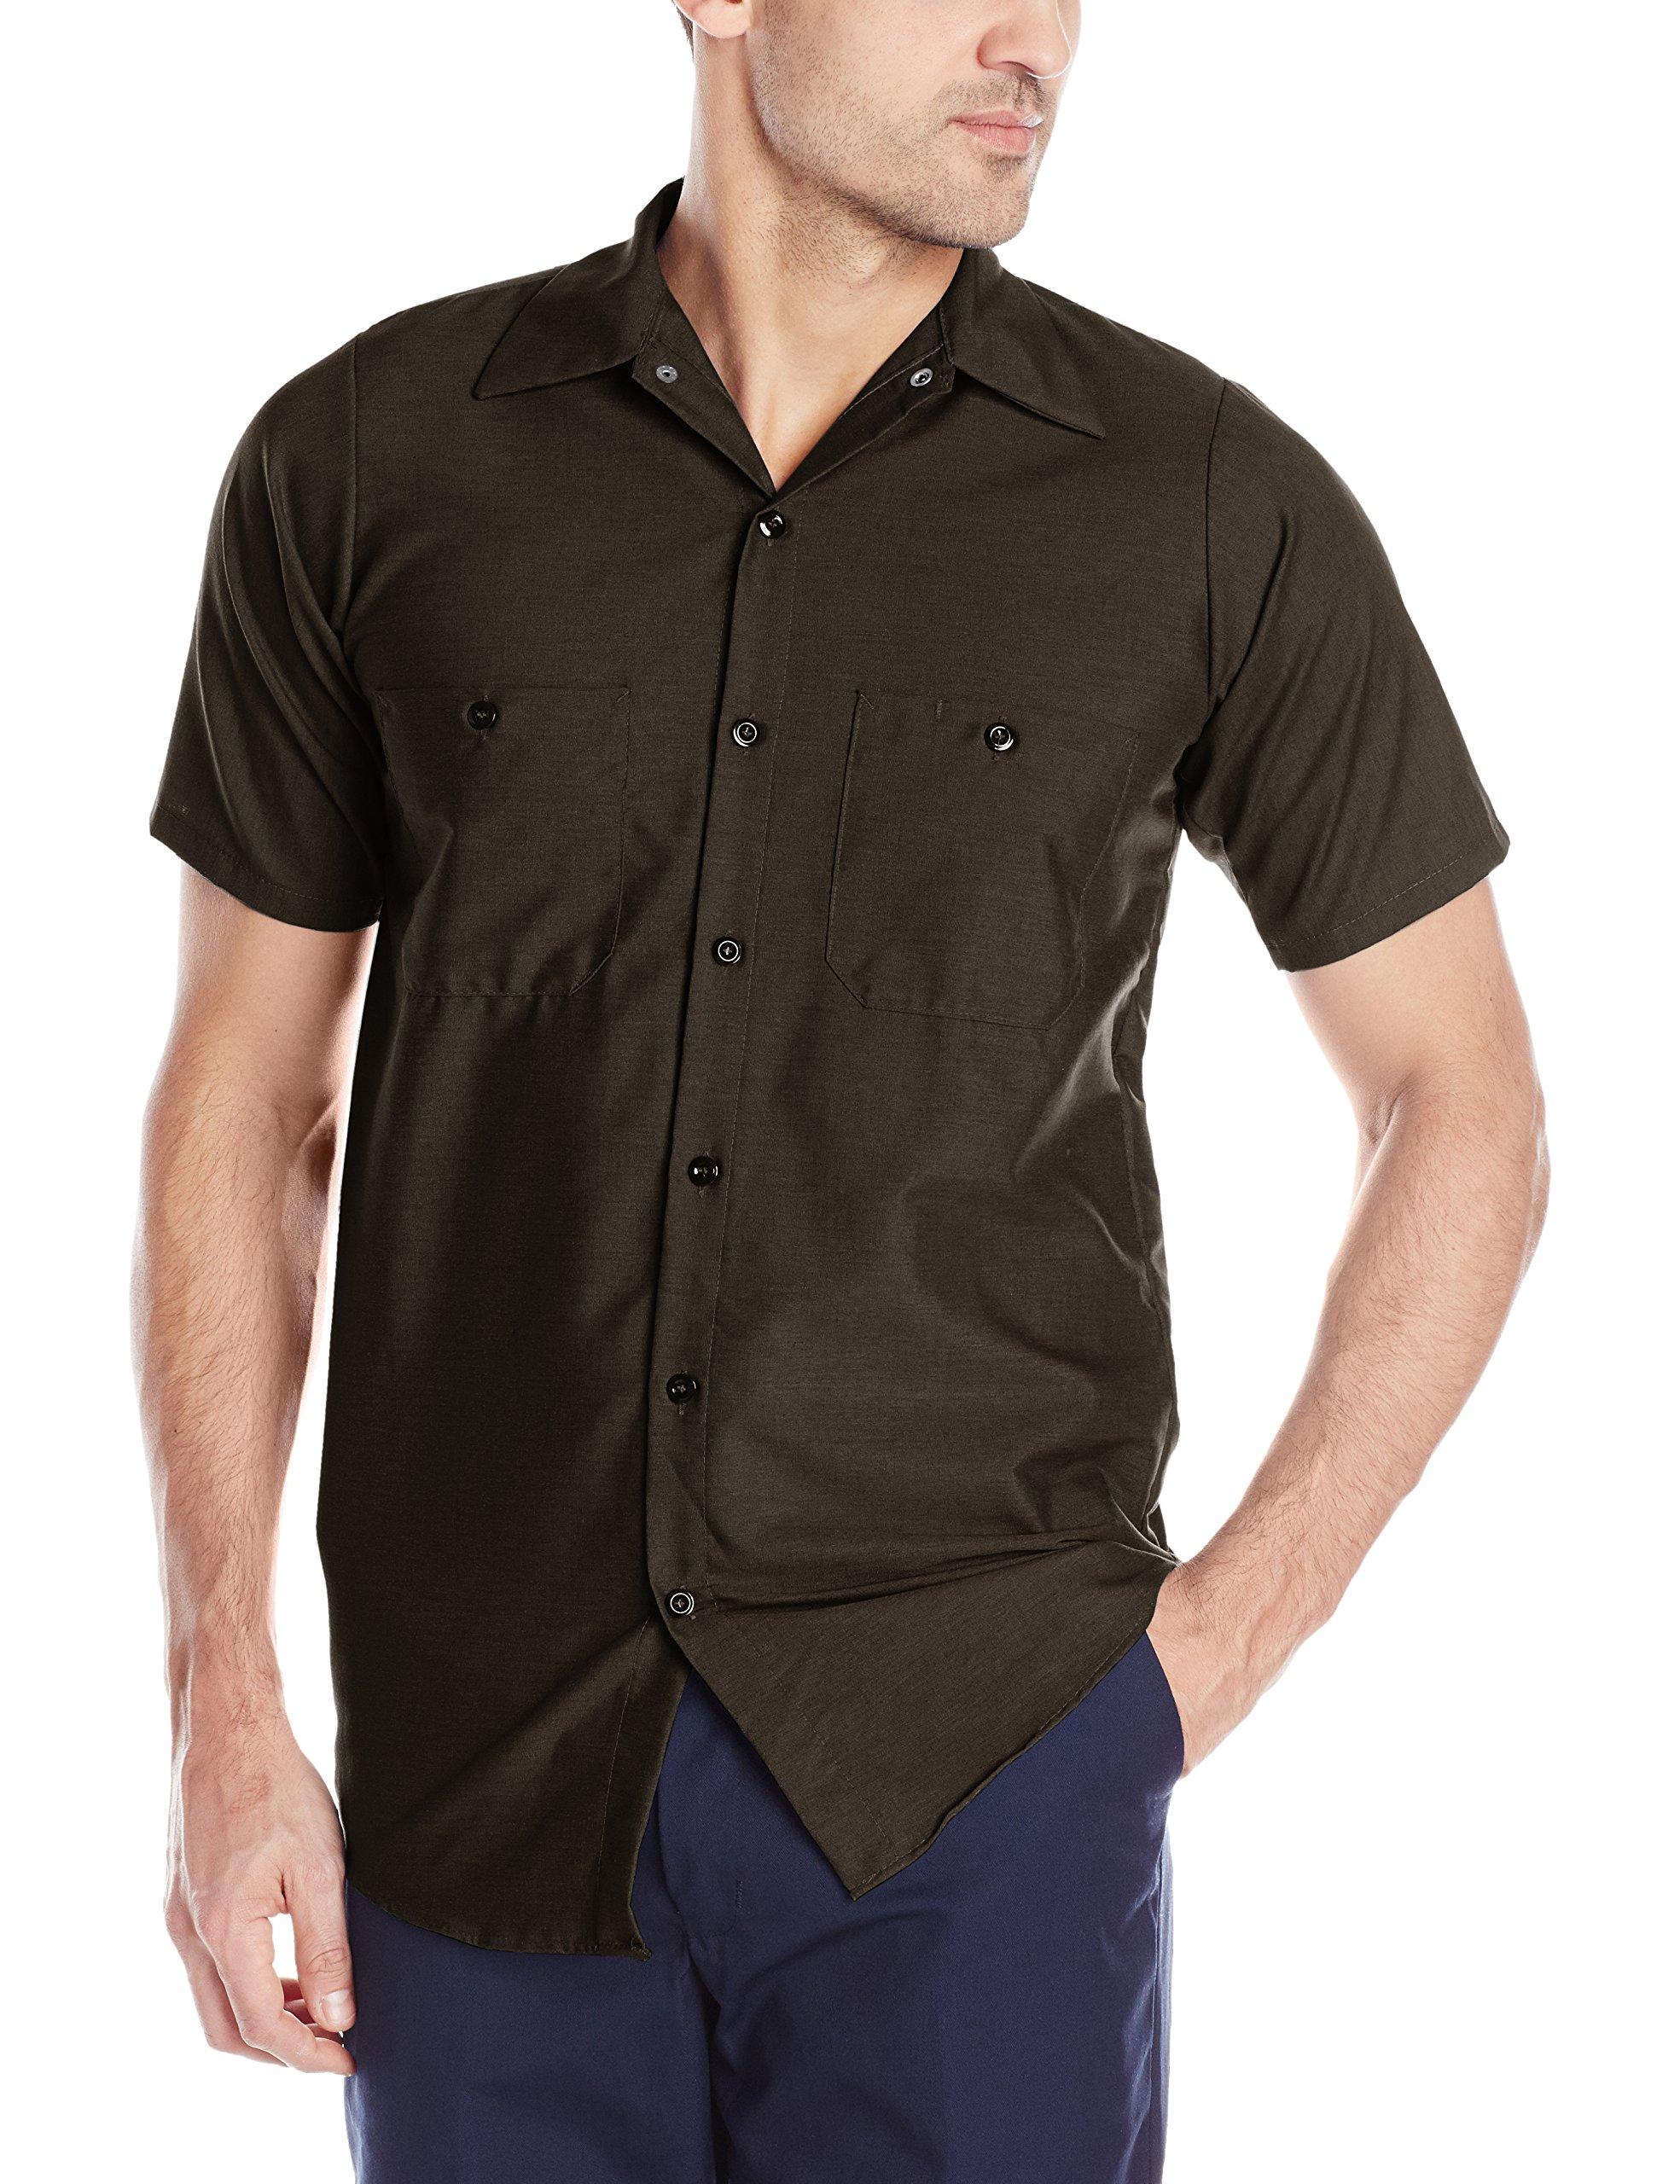 Red Kap Men's Industrial Short-Sleeve Work Shirt,Chocolate Brown, 2X-Large